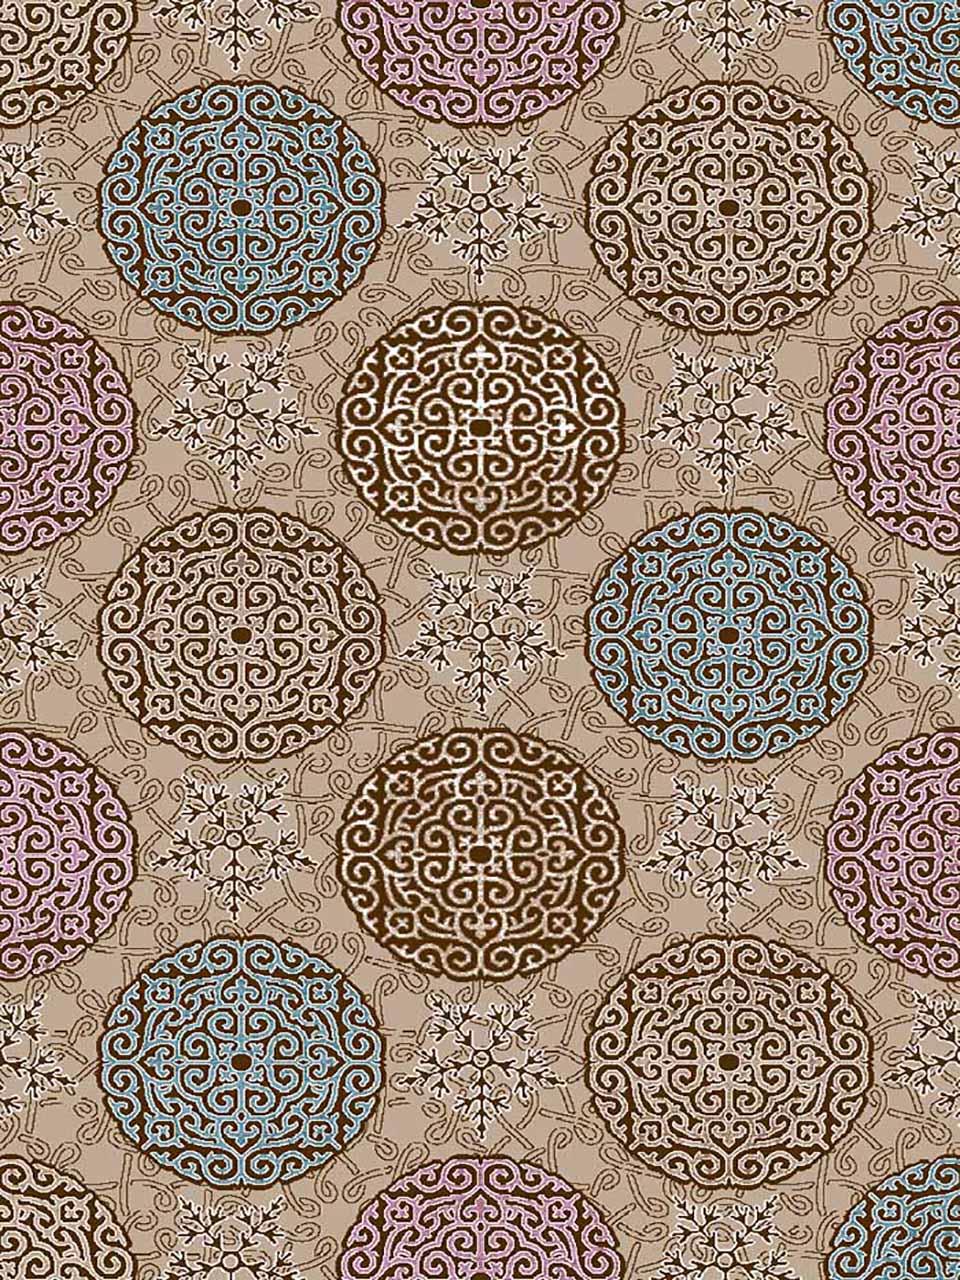 فرش (7034) پلی پرو پیلن - 8 رنگ - 410 شانه - قهوه ای - تراکم 1000